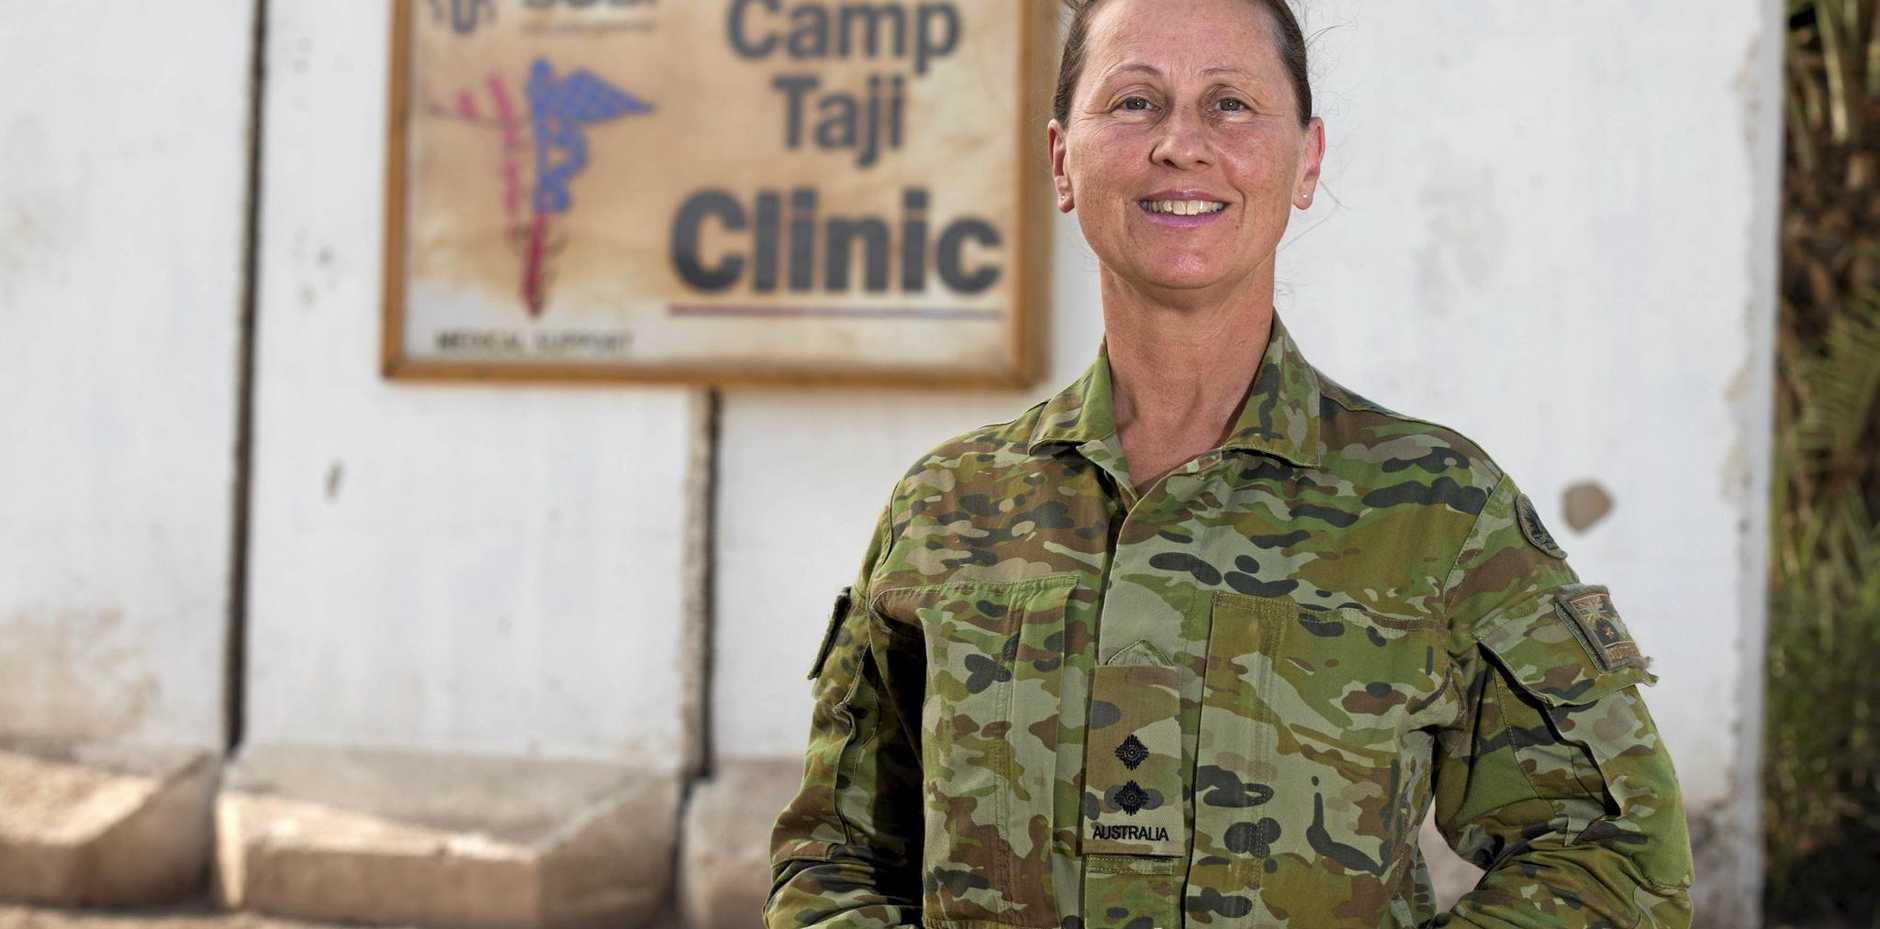 Australian Army officer Lieutenant Cheryl Liquorish of Pelican Waters has been deployed to Iraq with Task Group Taji 5.